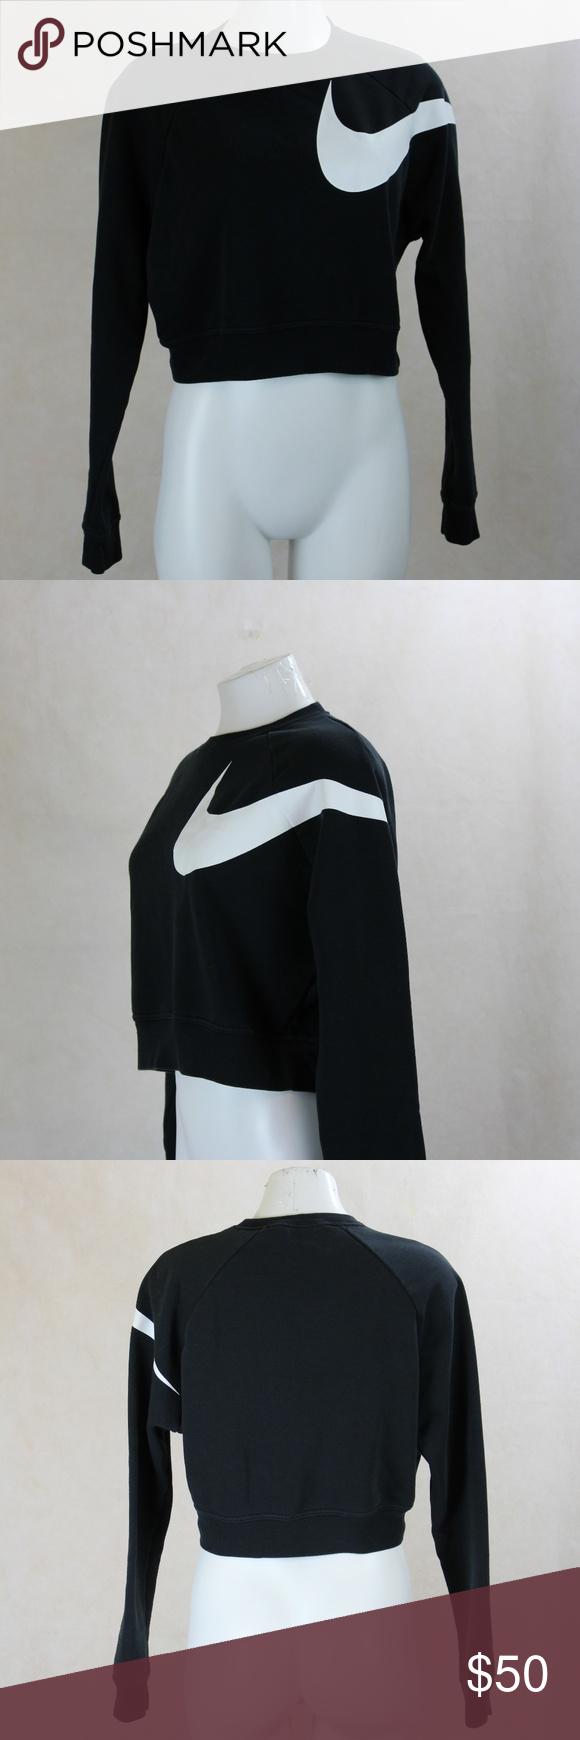 Vtg Nike Dri Fit Black Crop Sweatshirt Swoosh Crop Sweatshirt Sweatshirts Black Crop [ 1740 x 580 Pixel ]